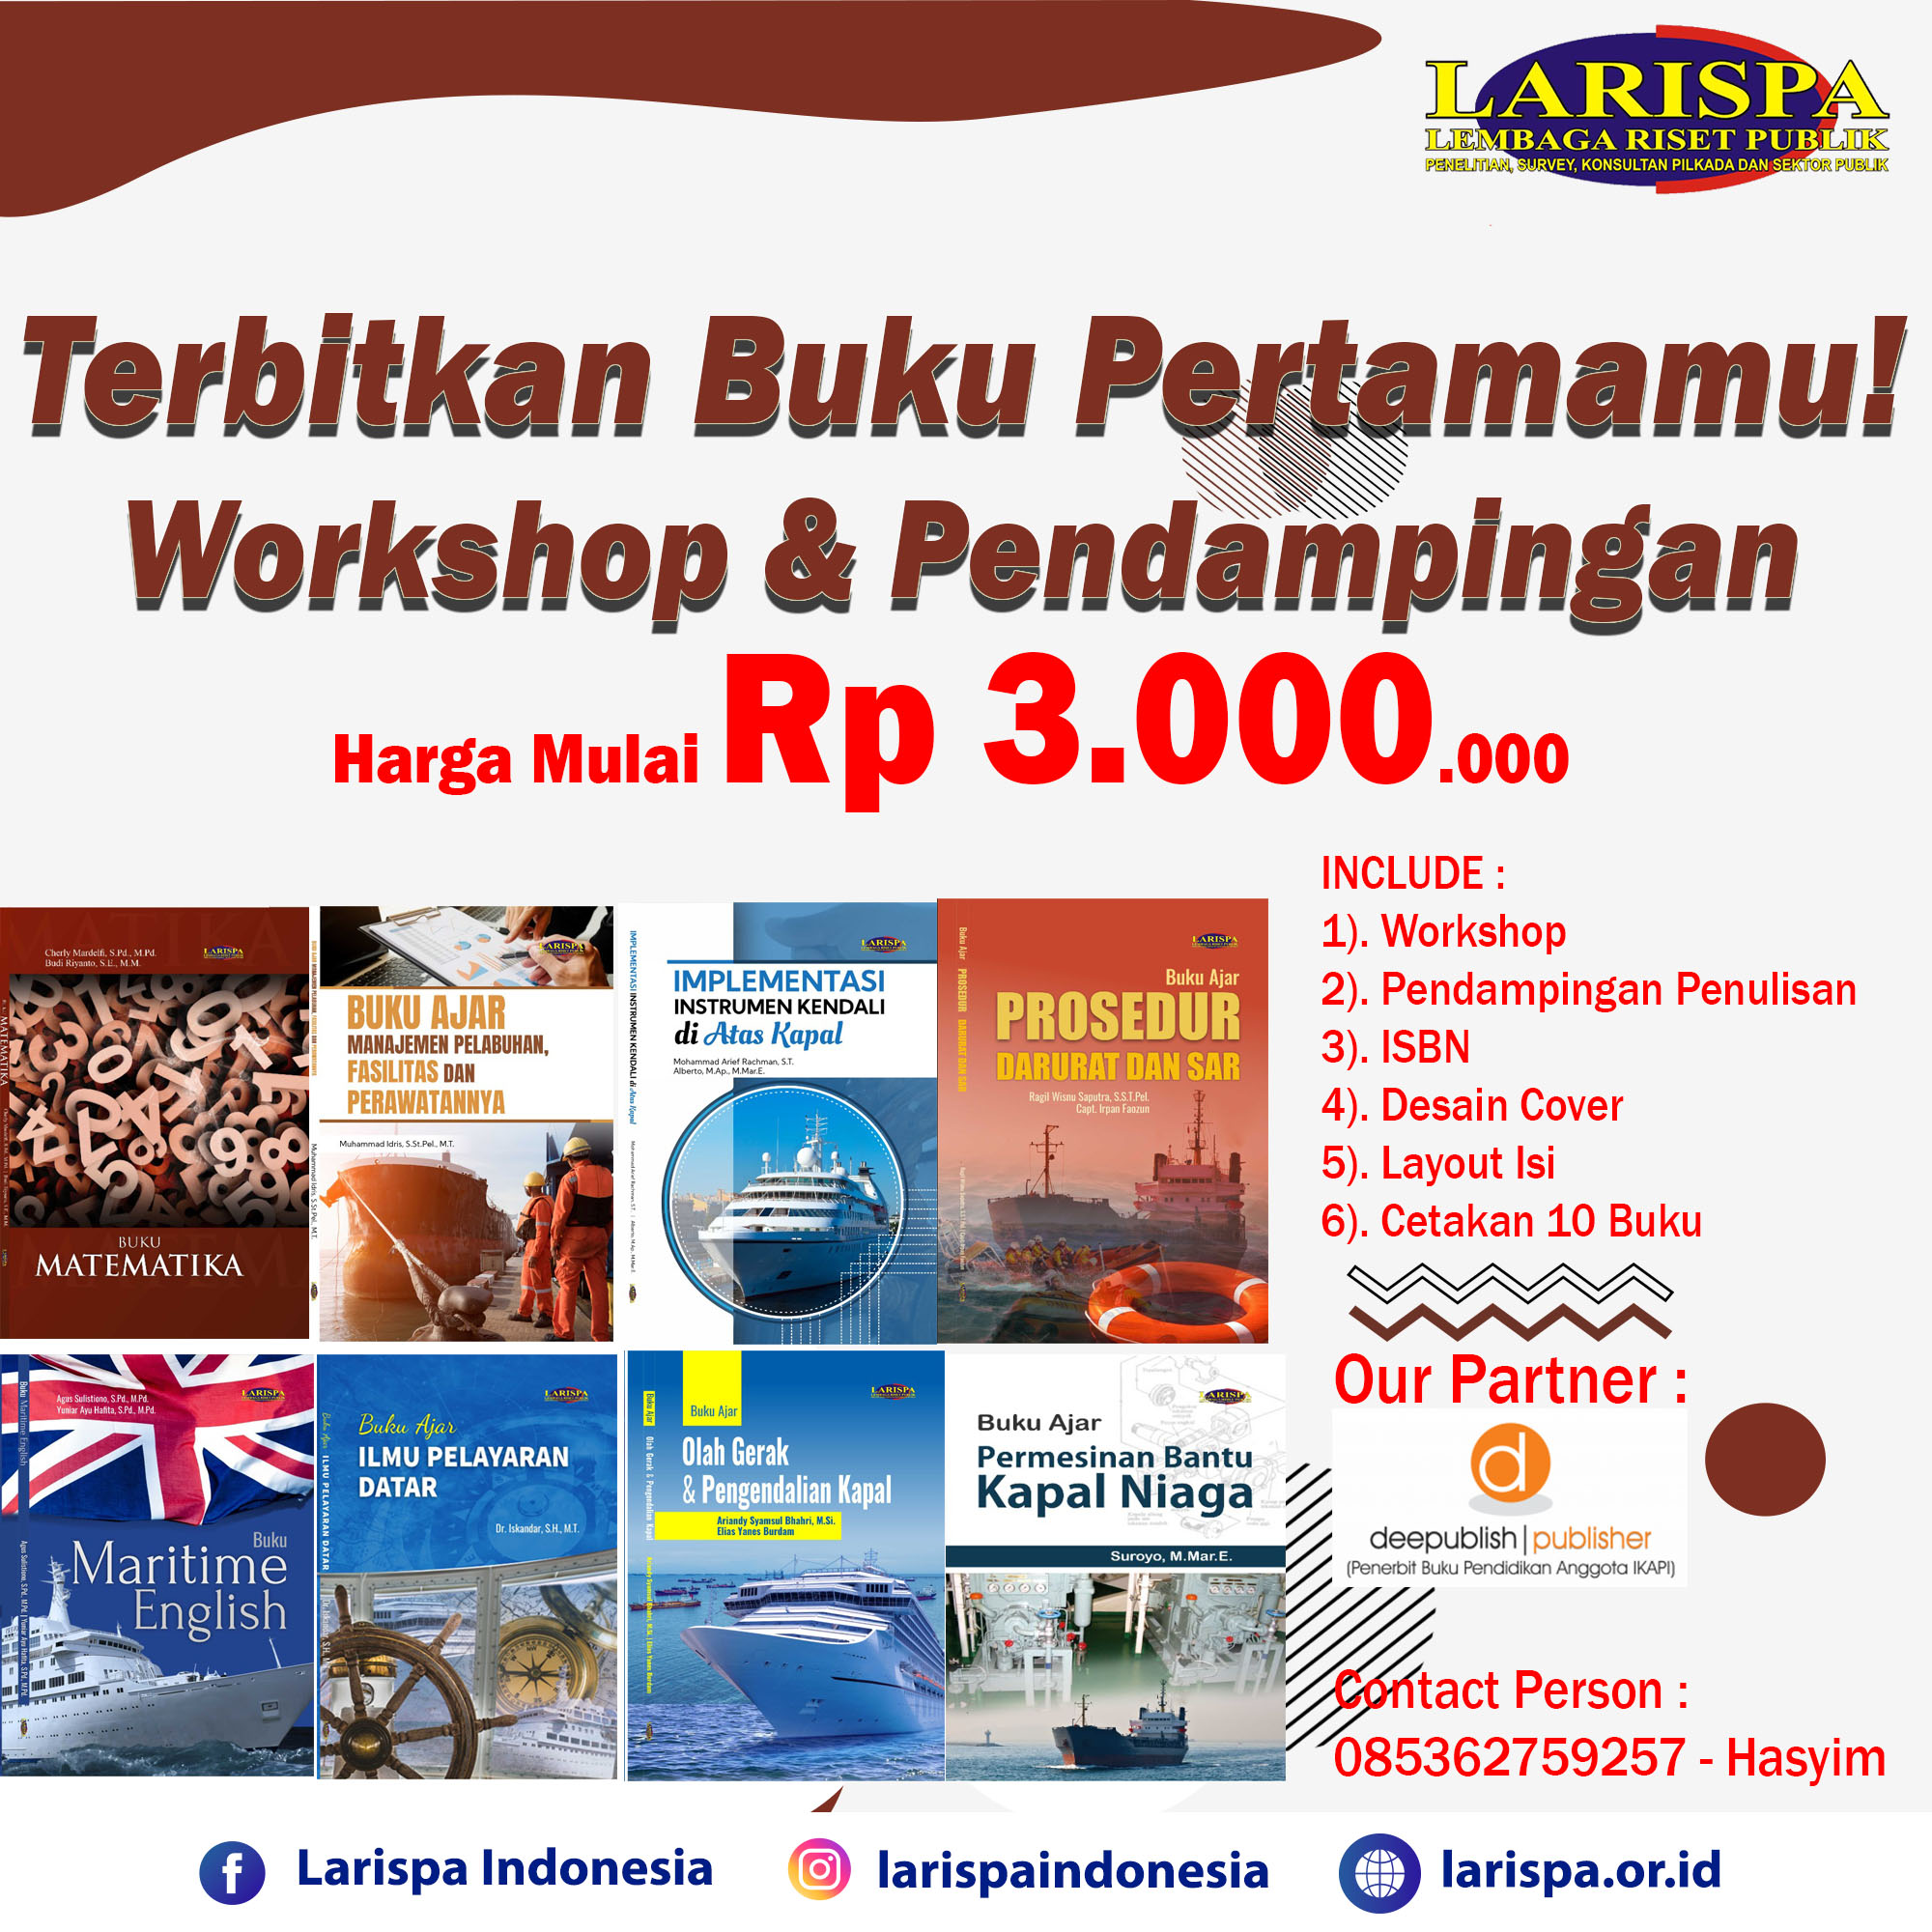 Terbitkan Buku Pertamamu Bersama Larispa Indonesia